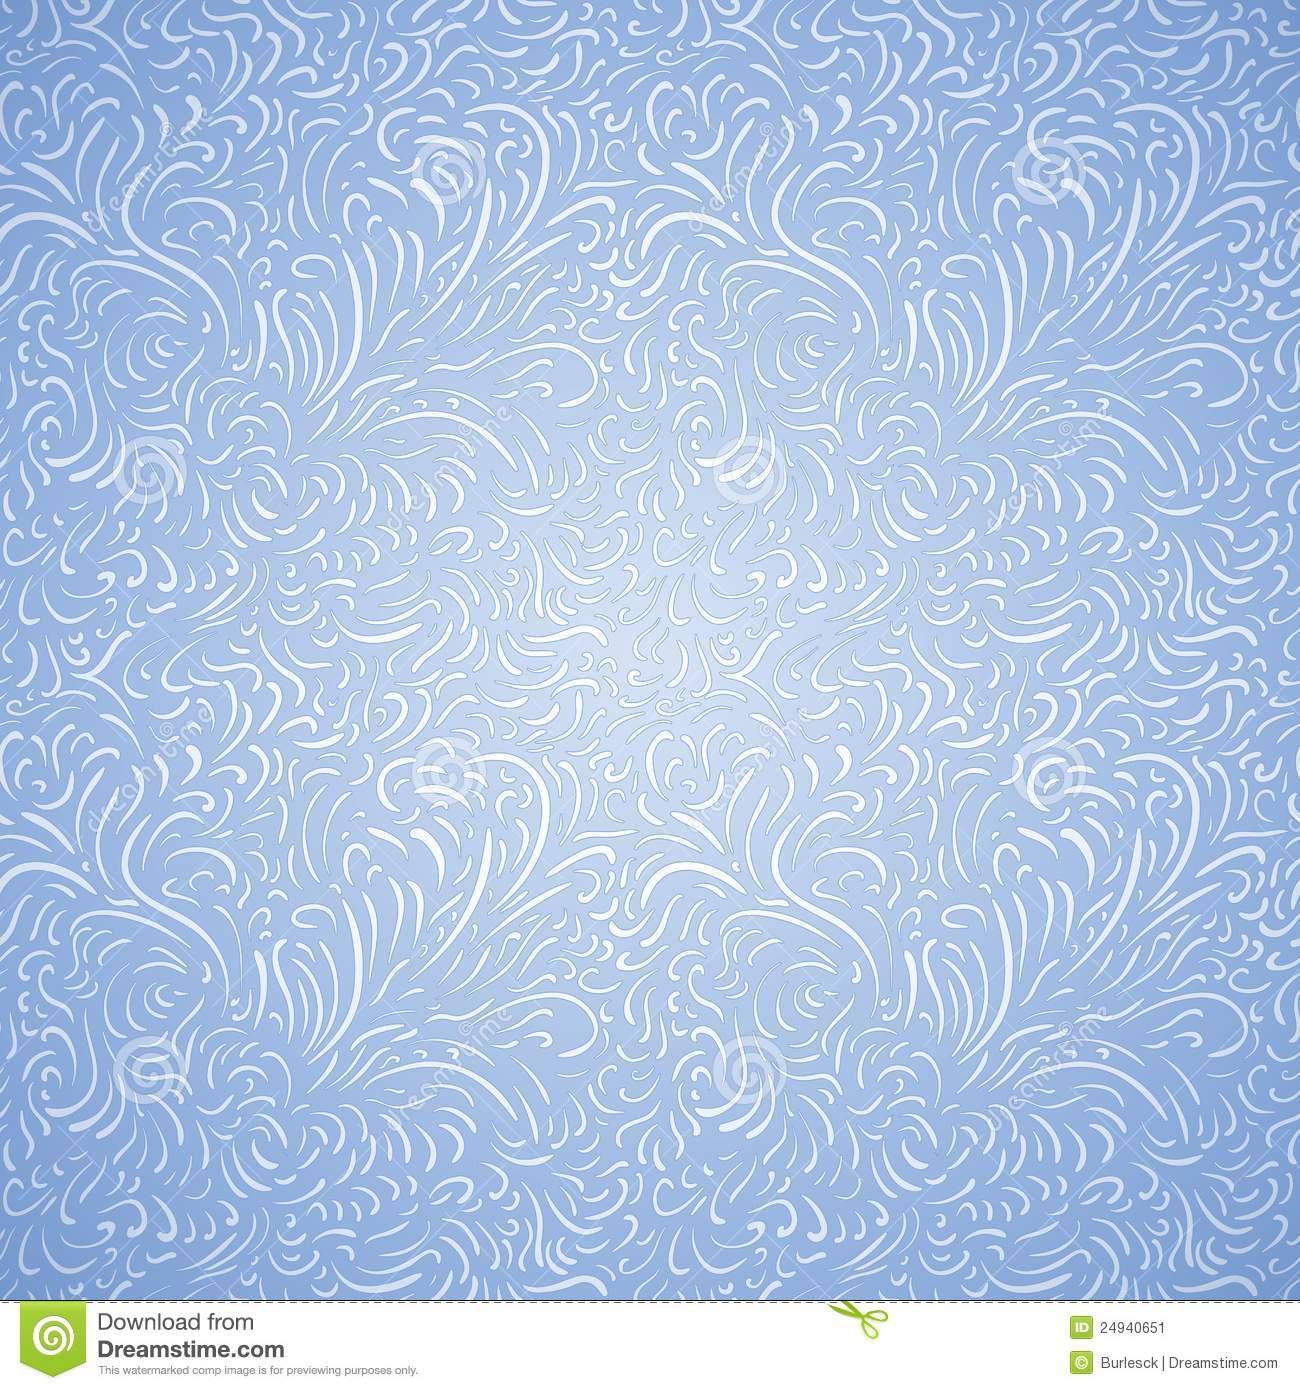 Seamless Frost Decor Pattern Stock Image.